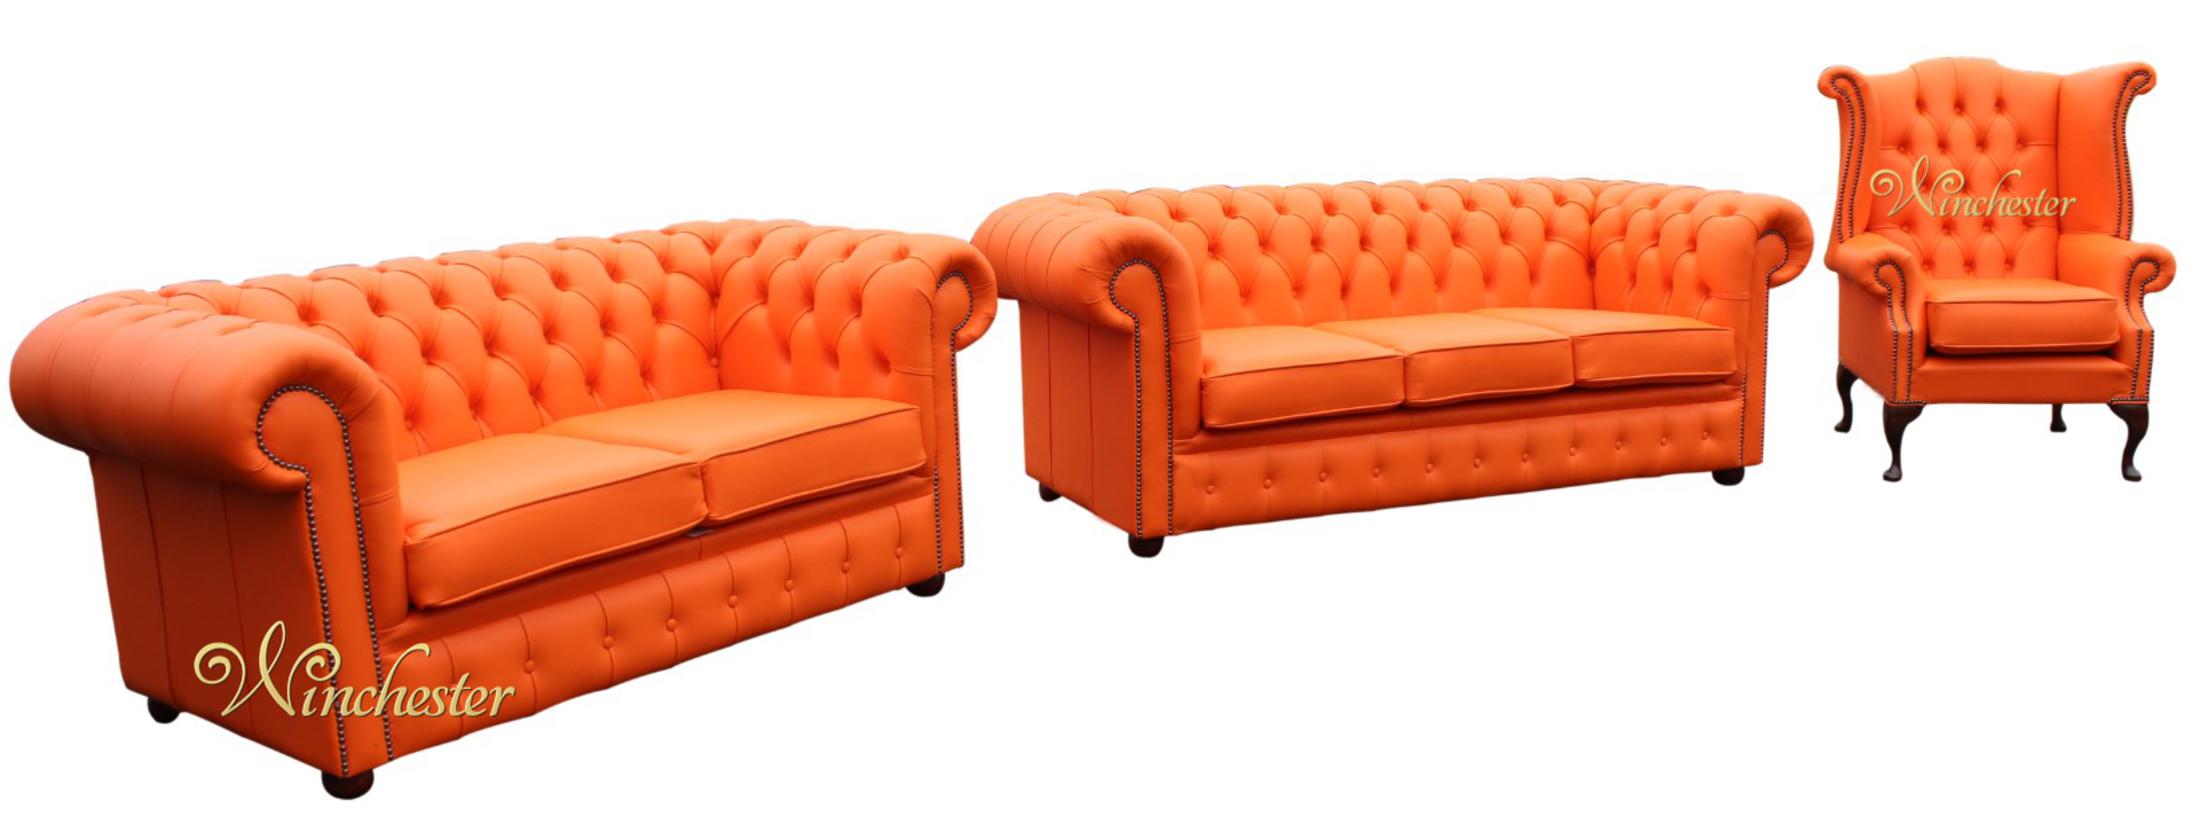 Chesterfield 3+2+1 Three Piece Leather Sofa Suite Mandarin Orange Offer